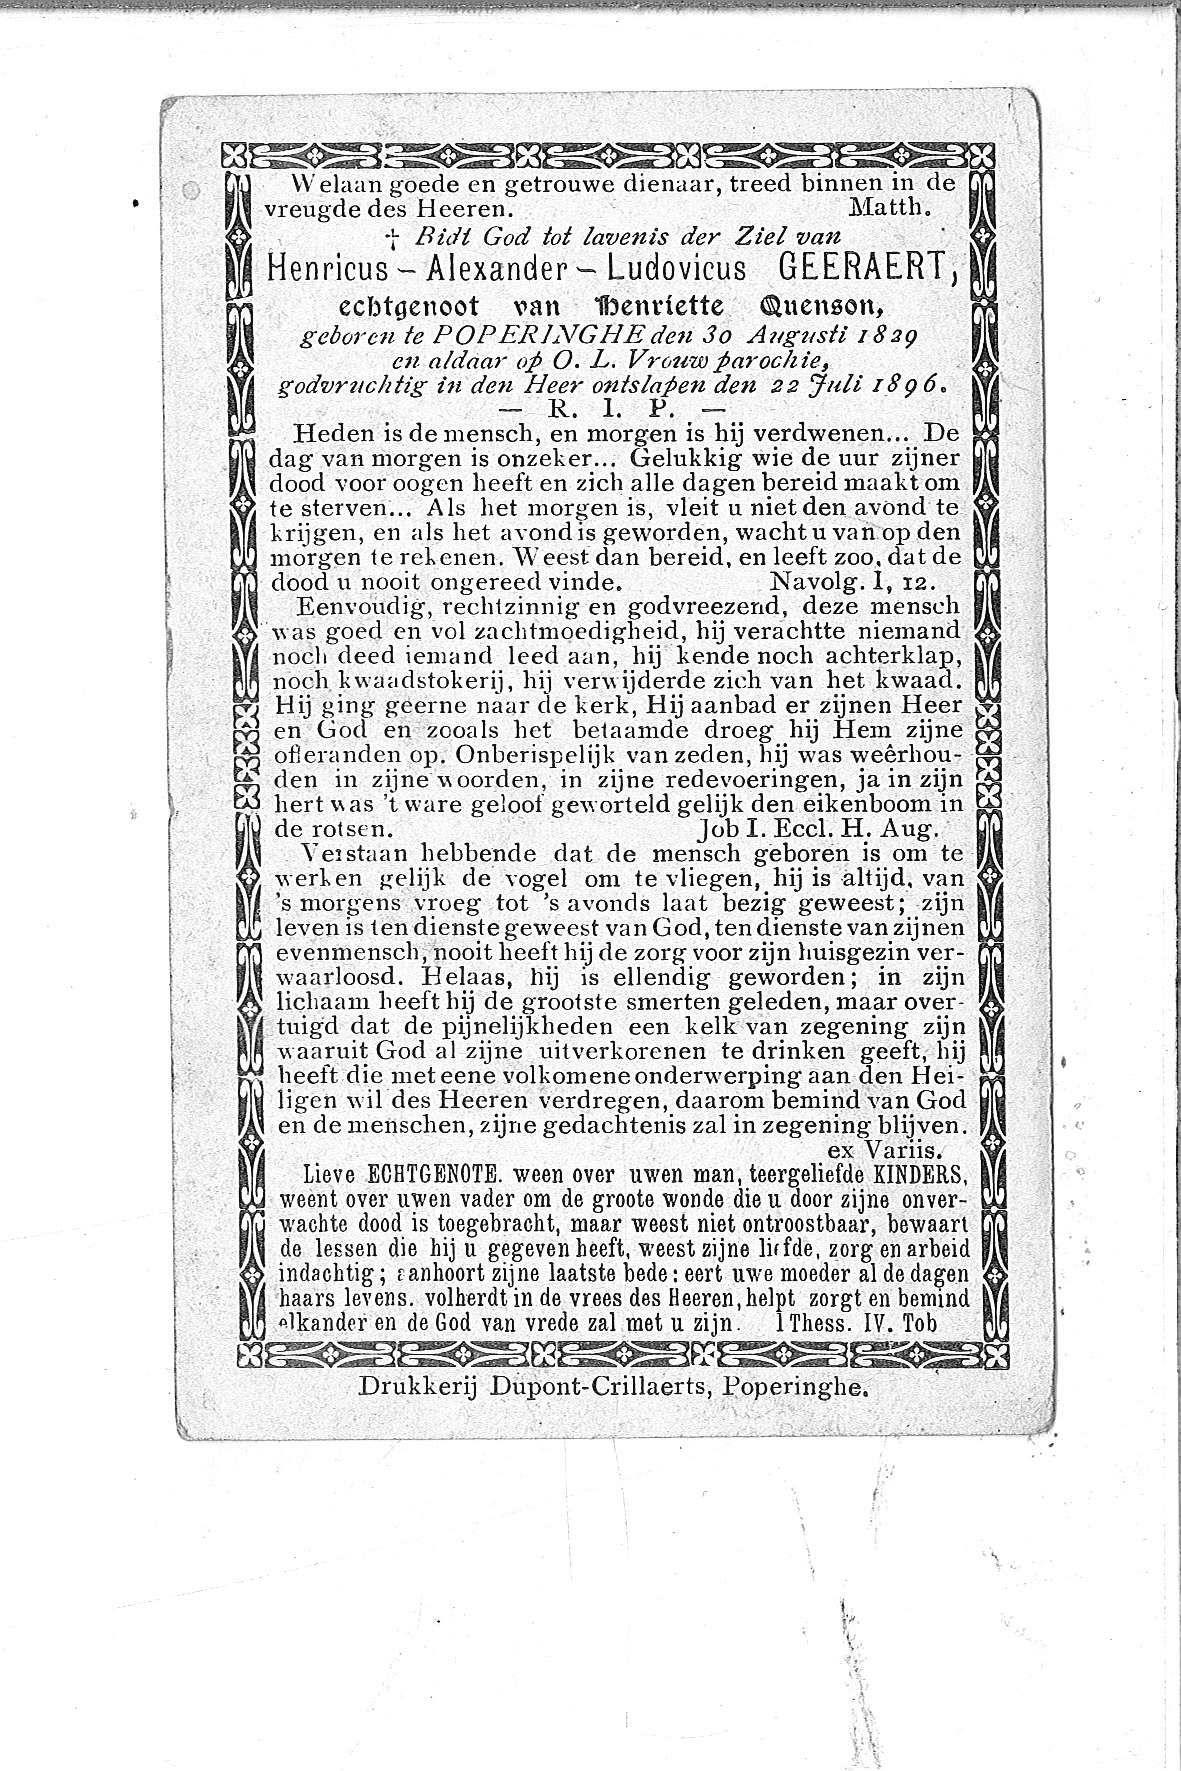 Hendricus-Alexander-Ludovicus(1896)20130821155154_00011.jpg